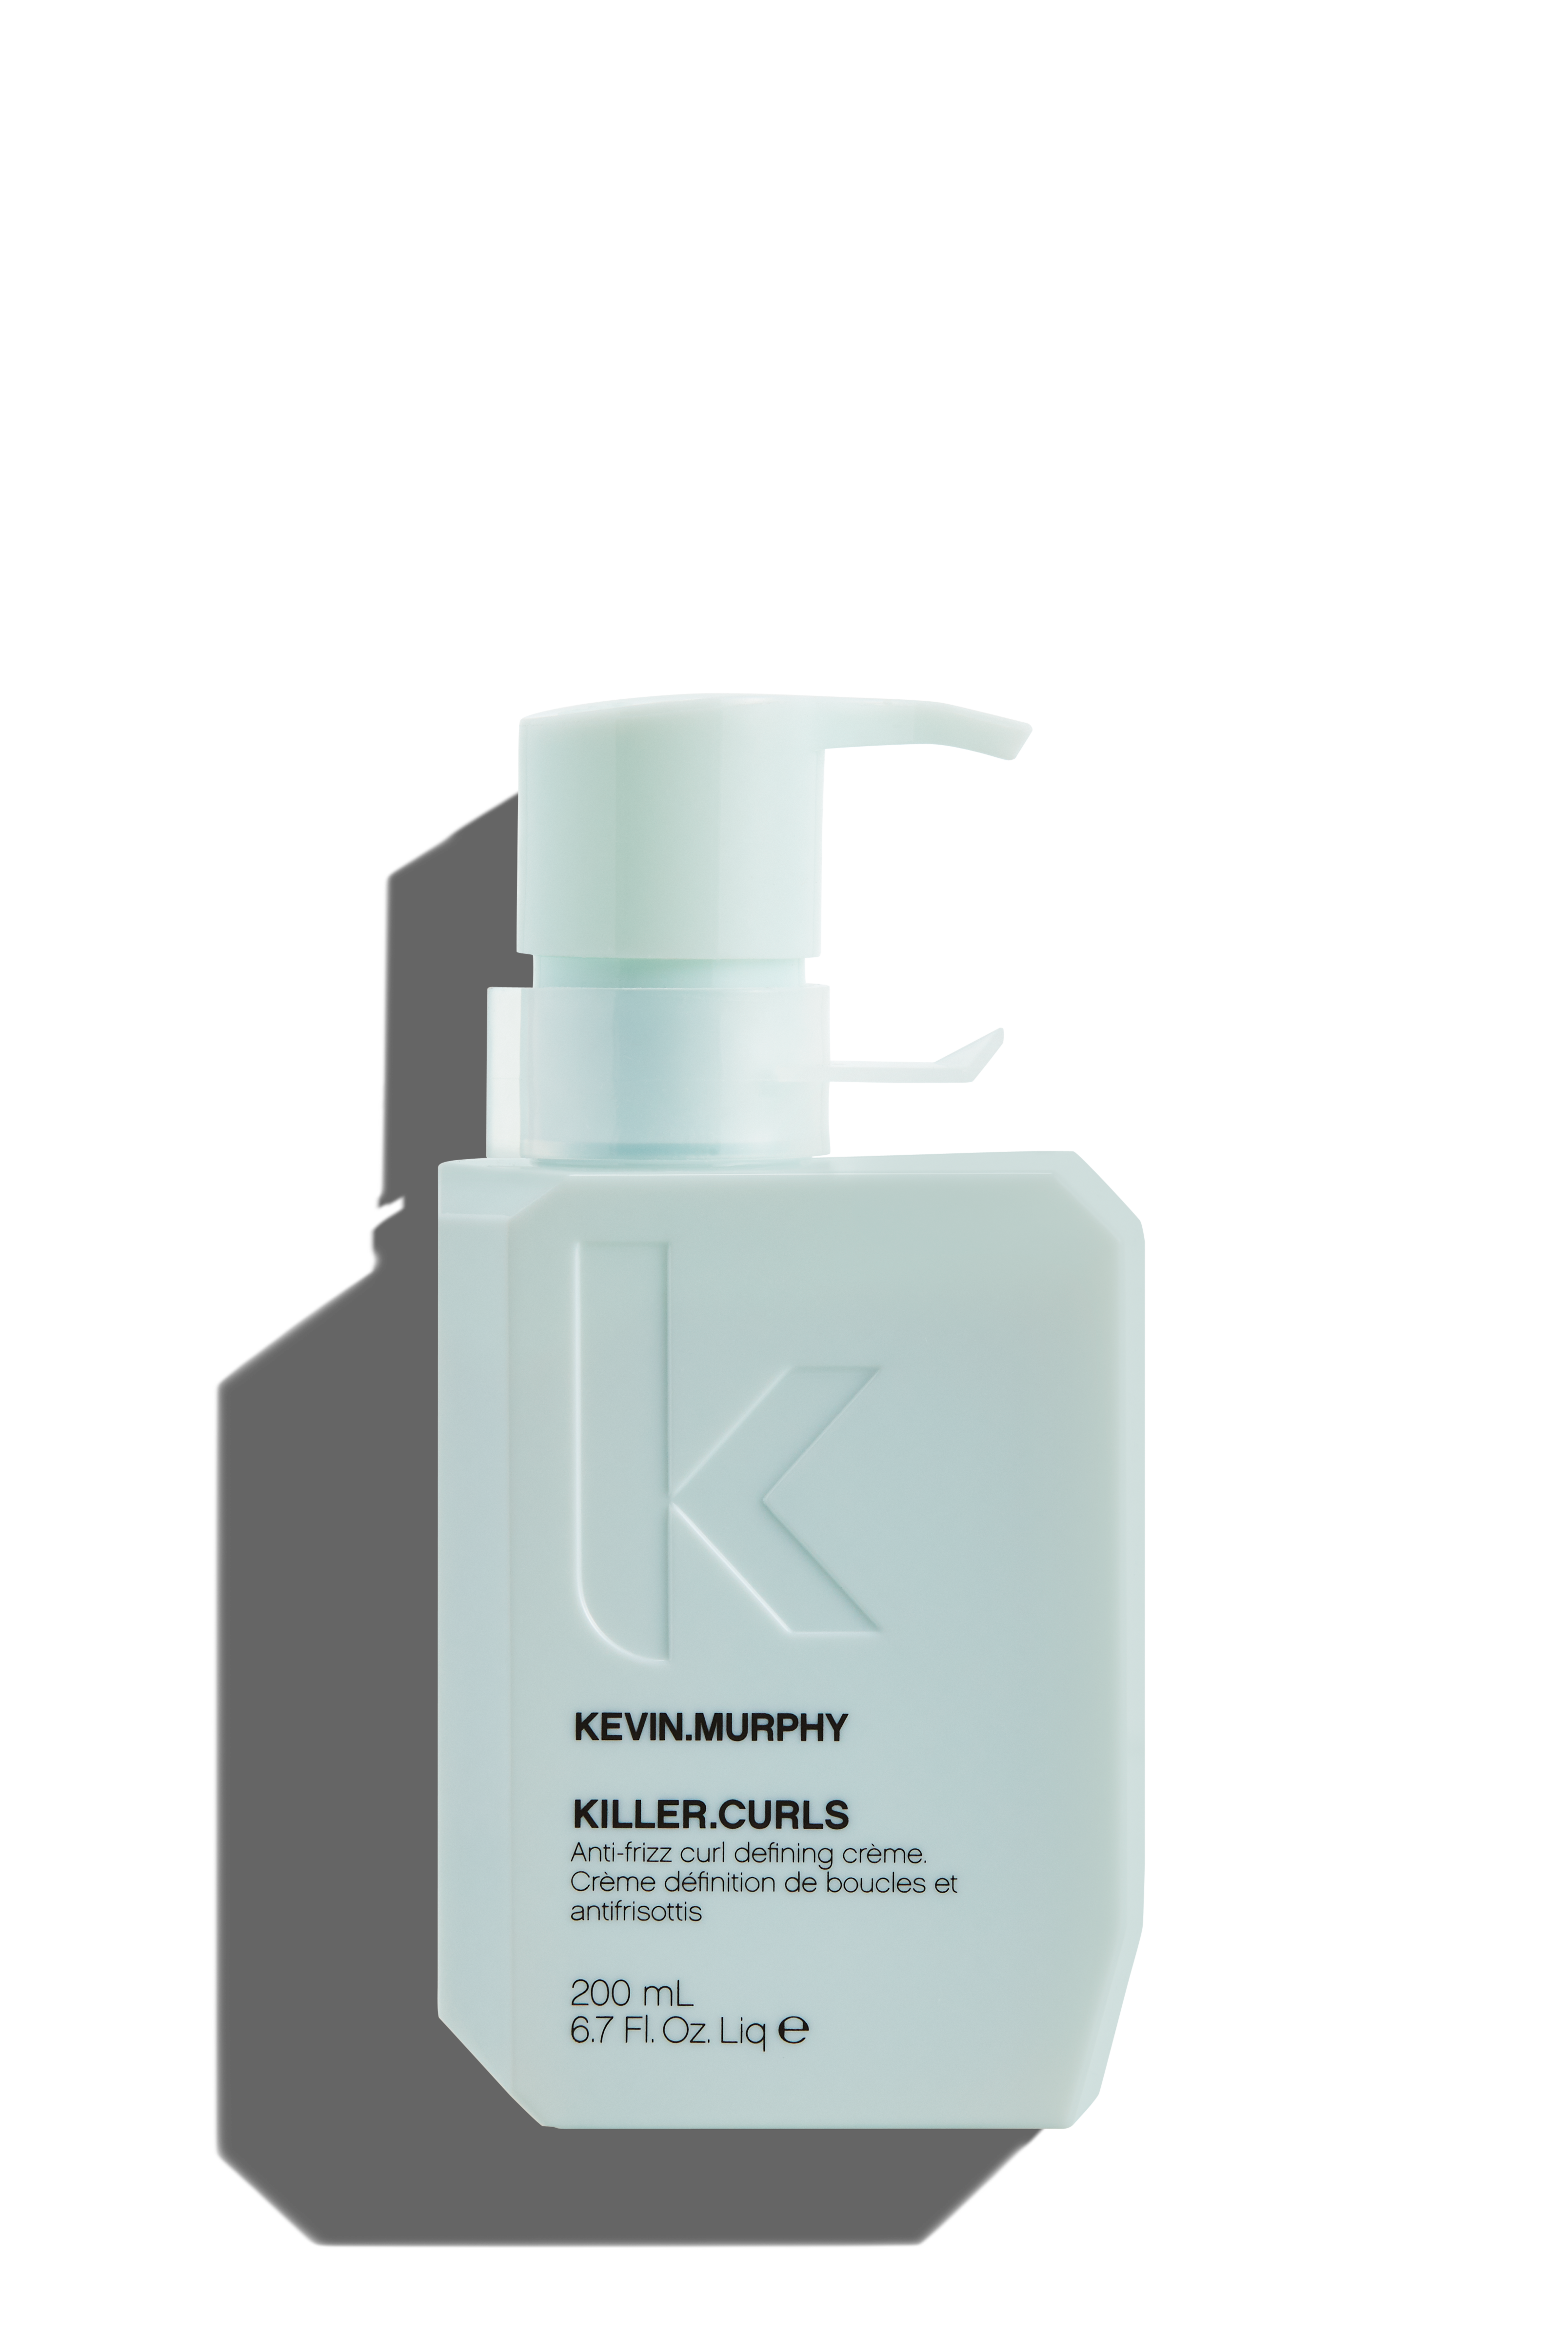 Killer curls hair product